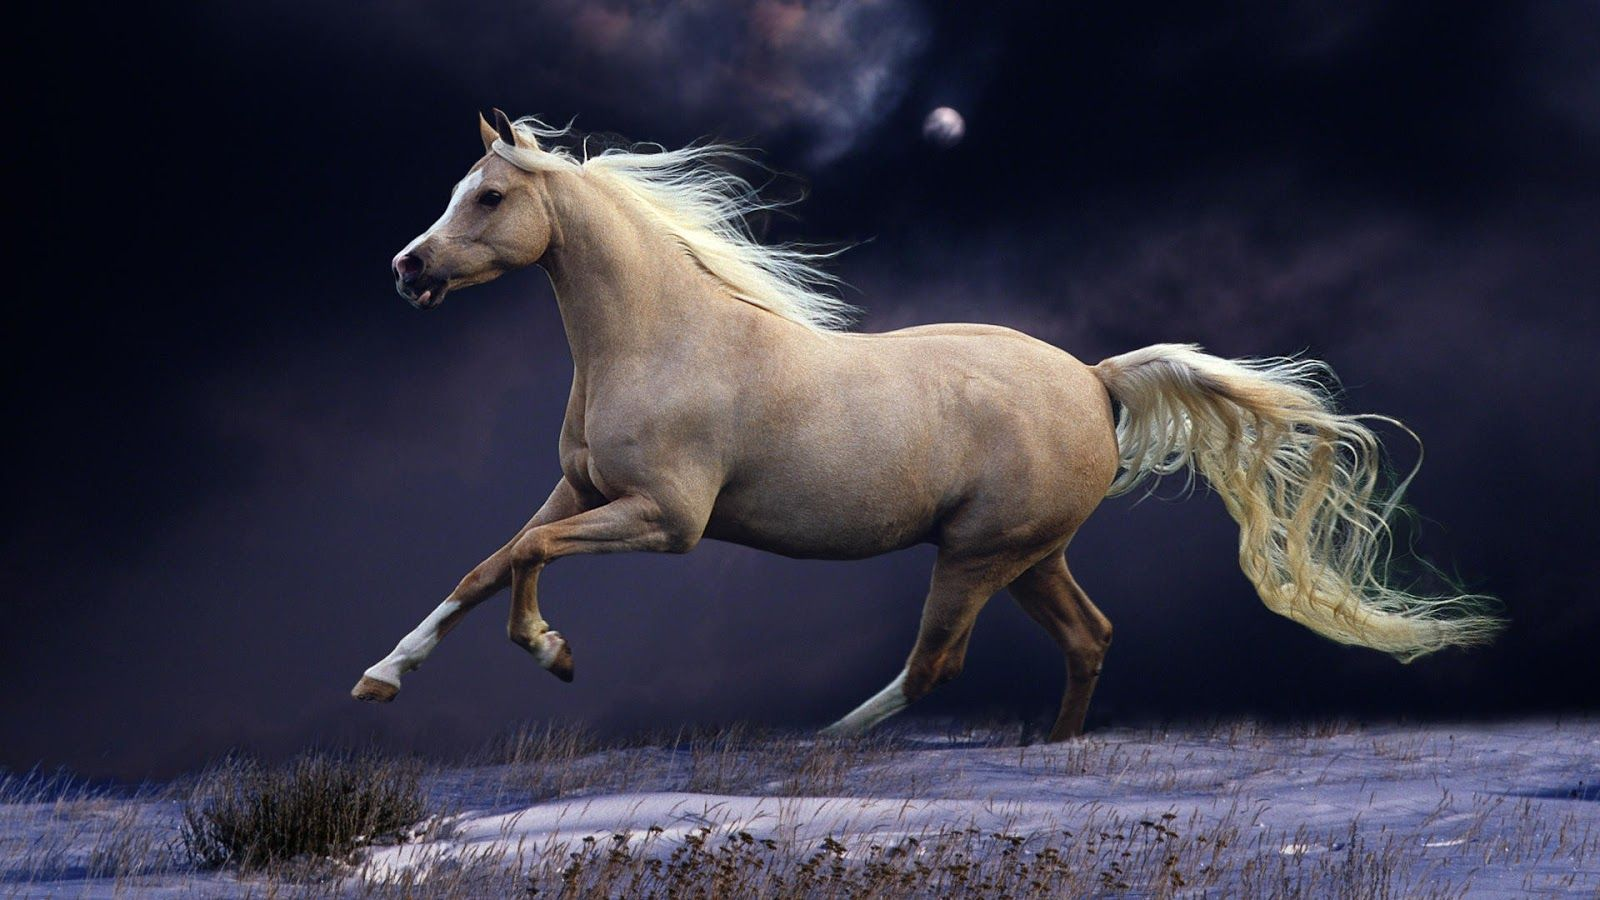 Pin On Horse Pics